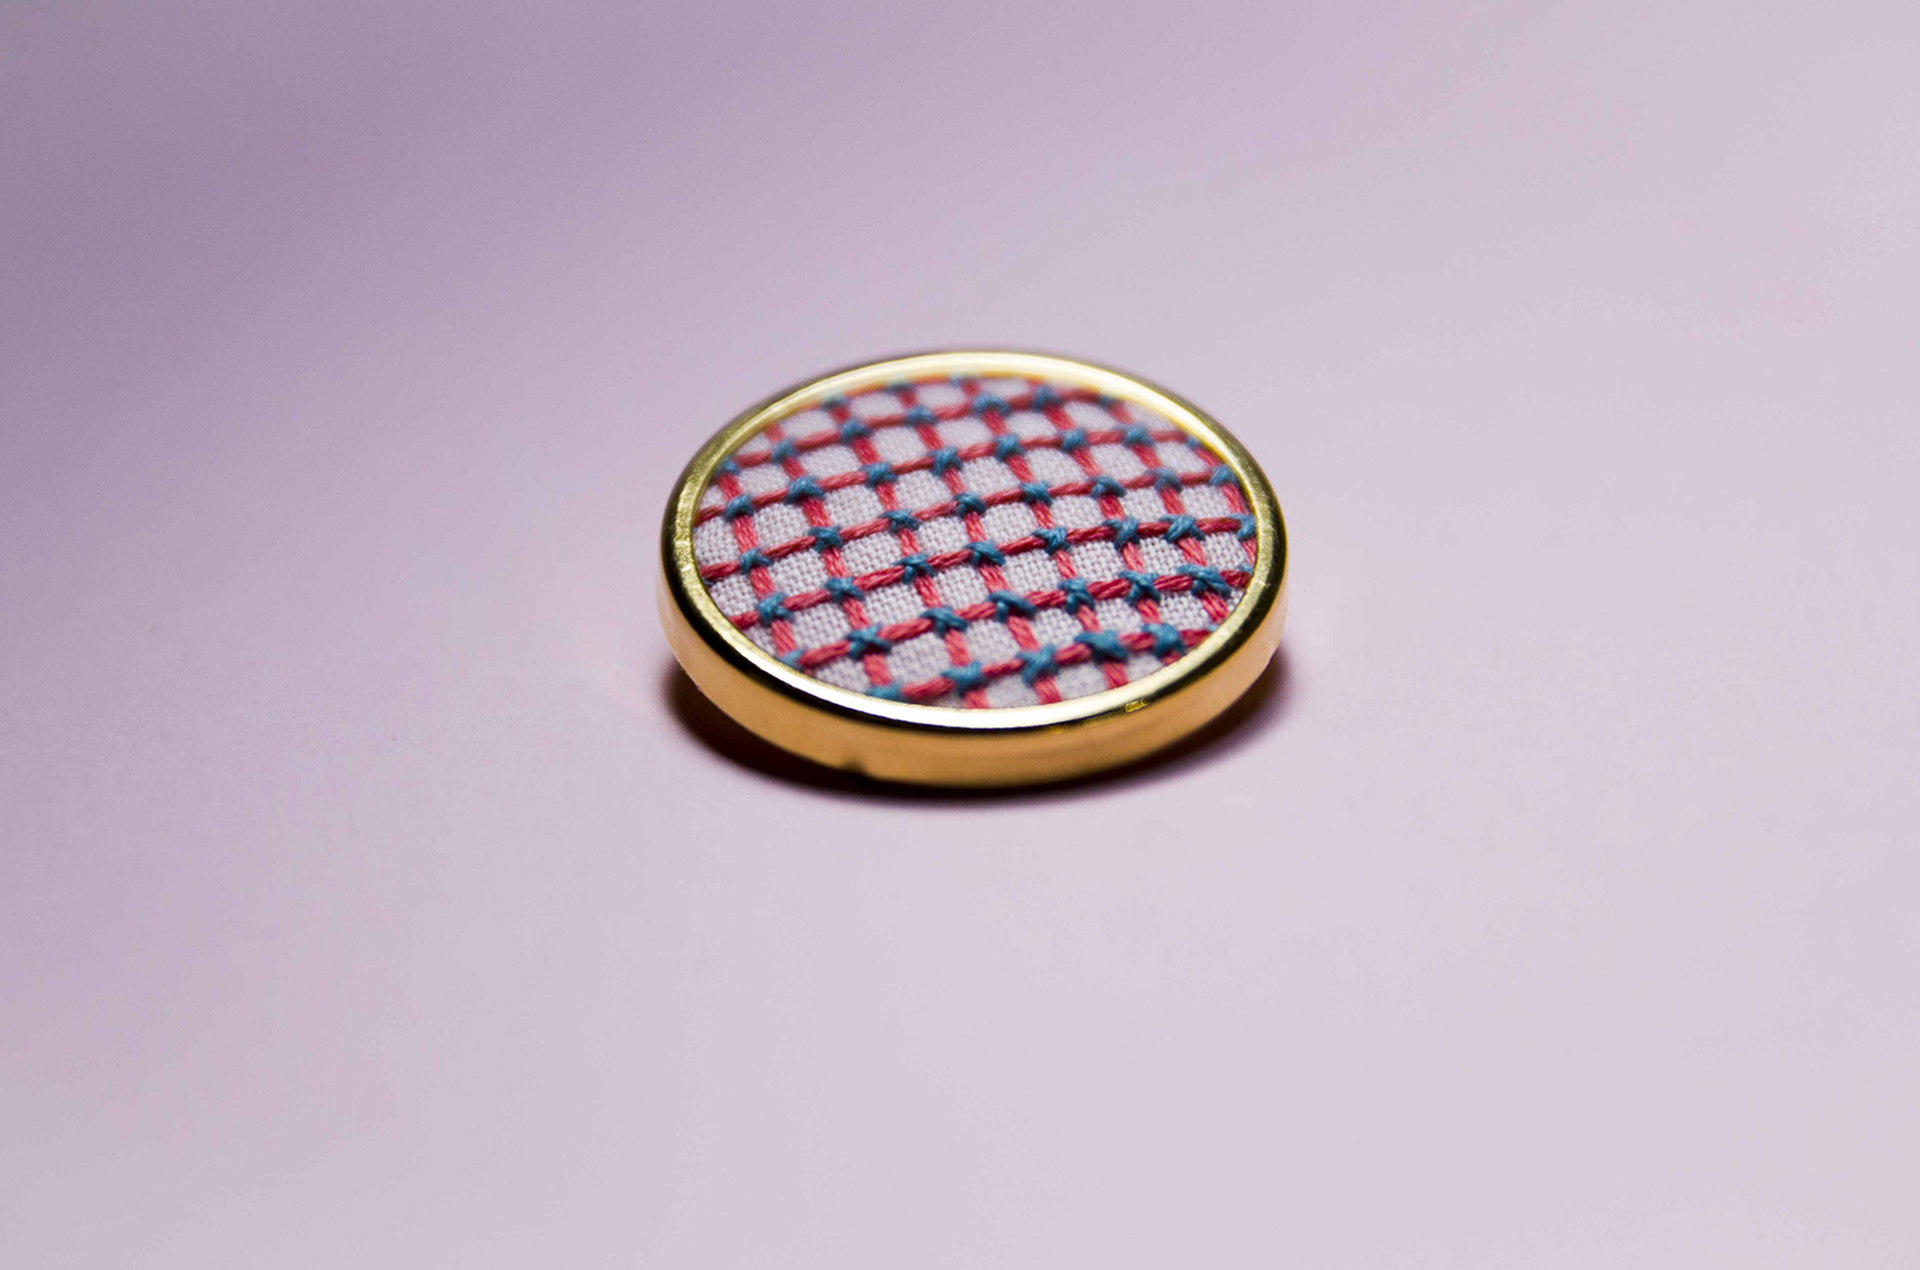 Pink Criss-Cross Pin